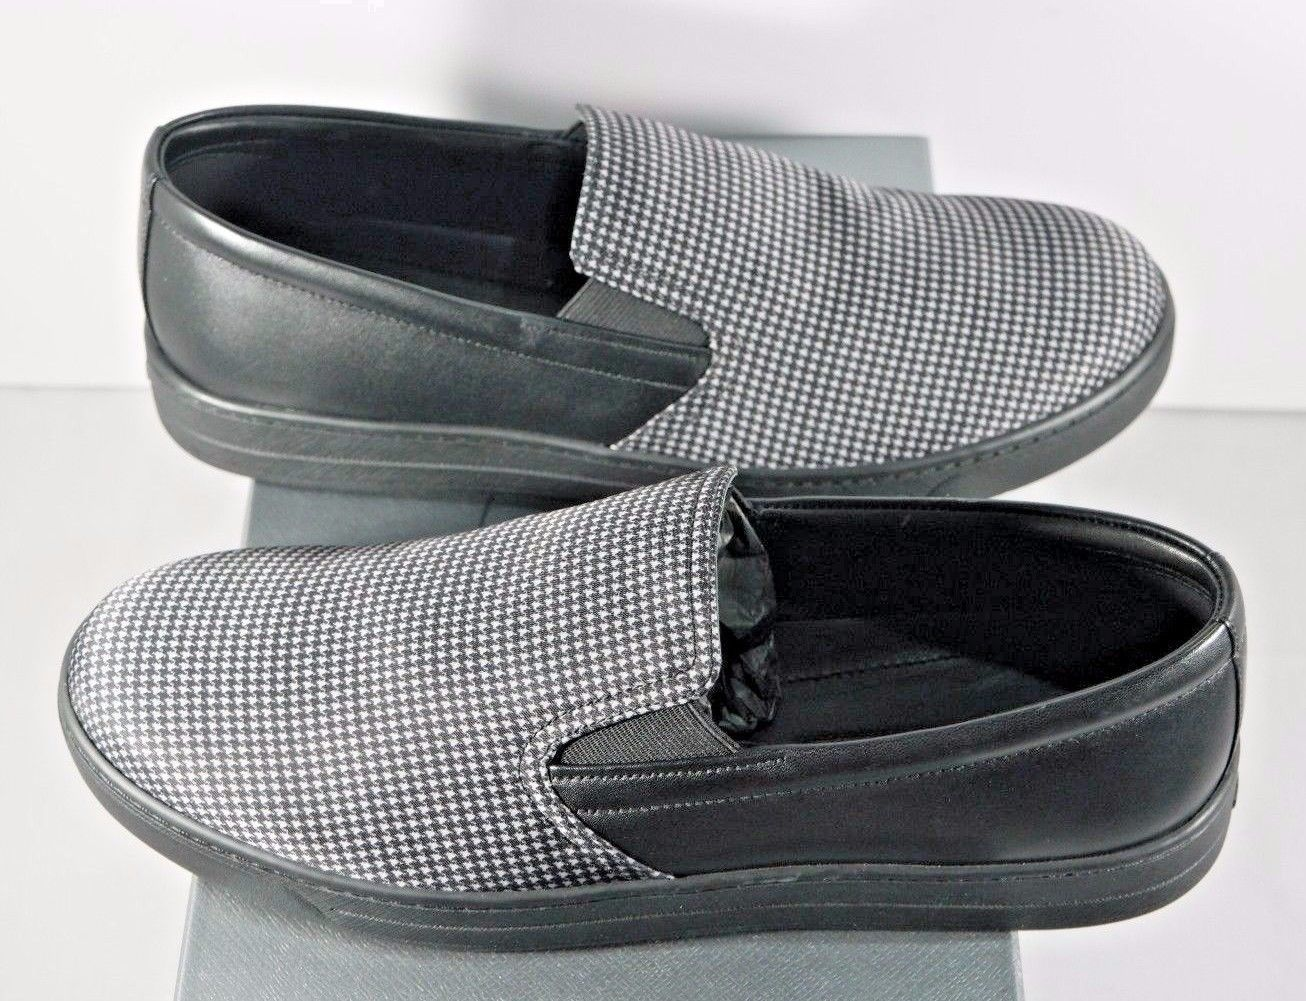 NIB Prada Black Houndstooth Nylon Leather Slip-On Sneaker Loafer Shoes 9